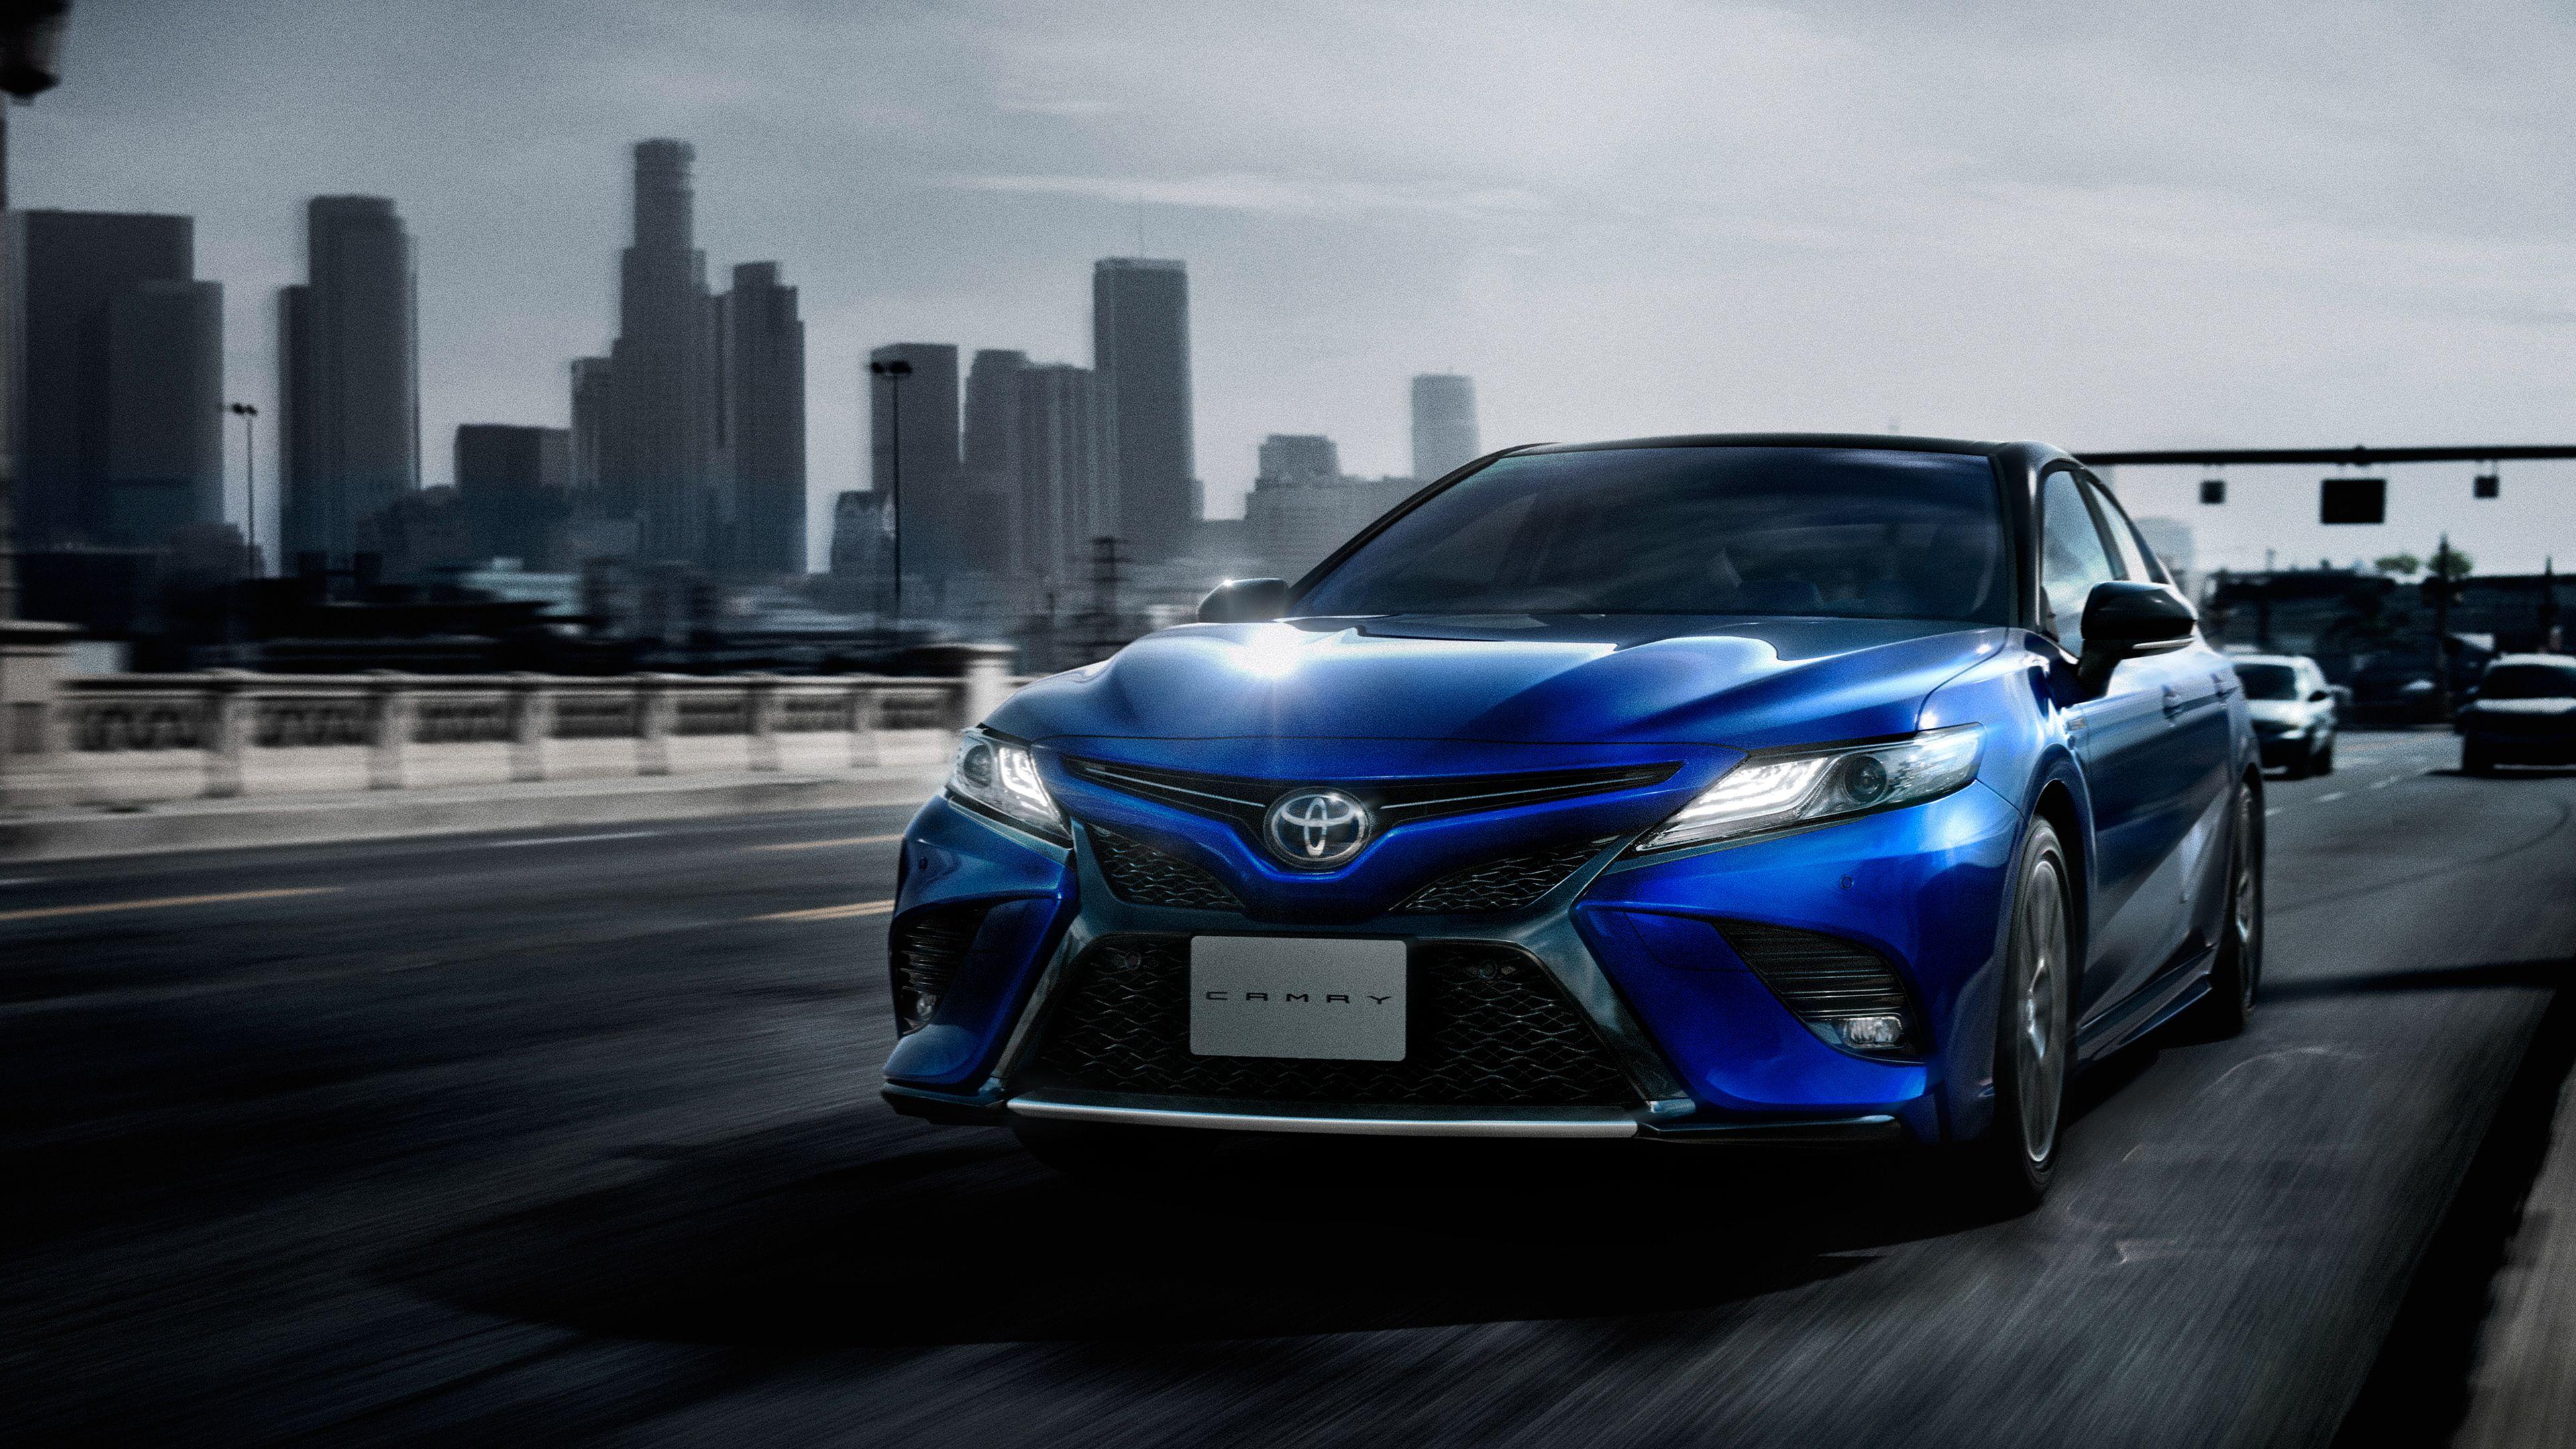 Toyota Camry Hybrid Wallpaper di 2020